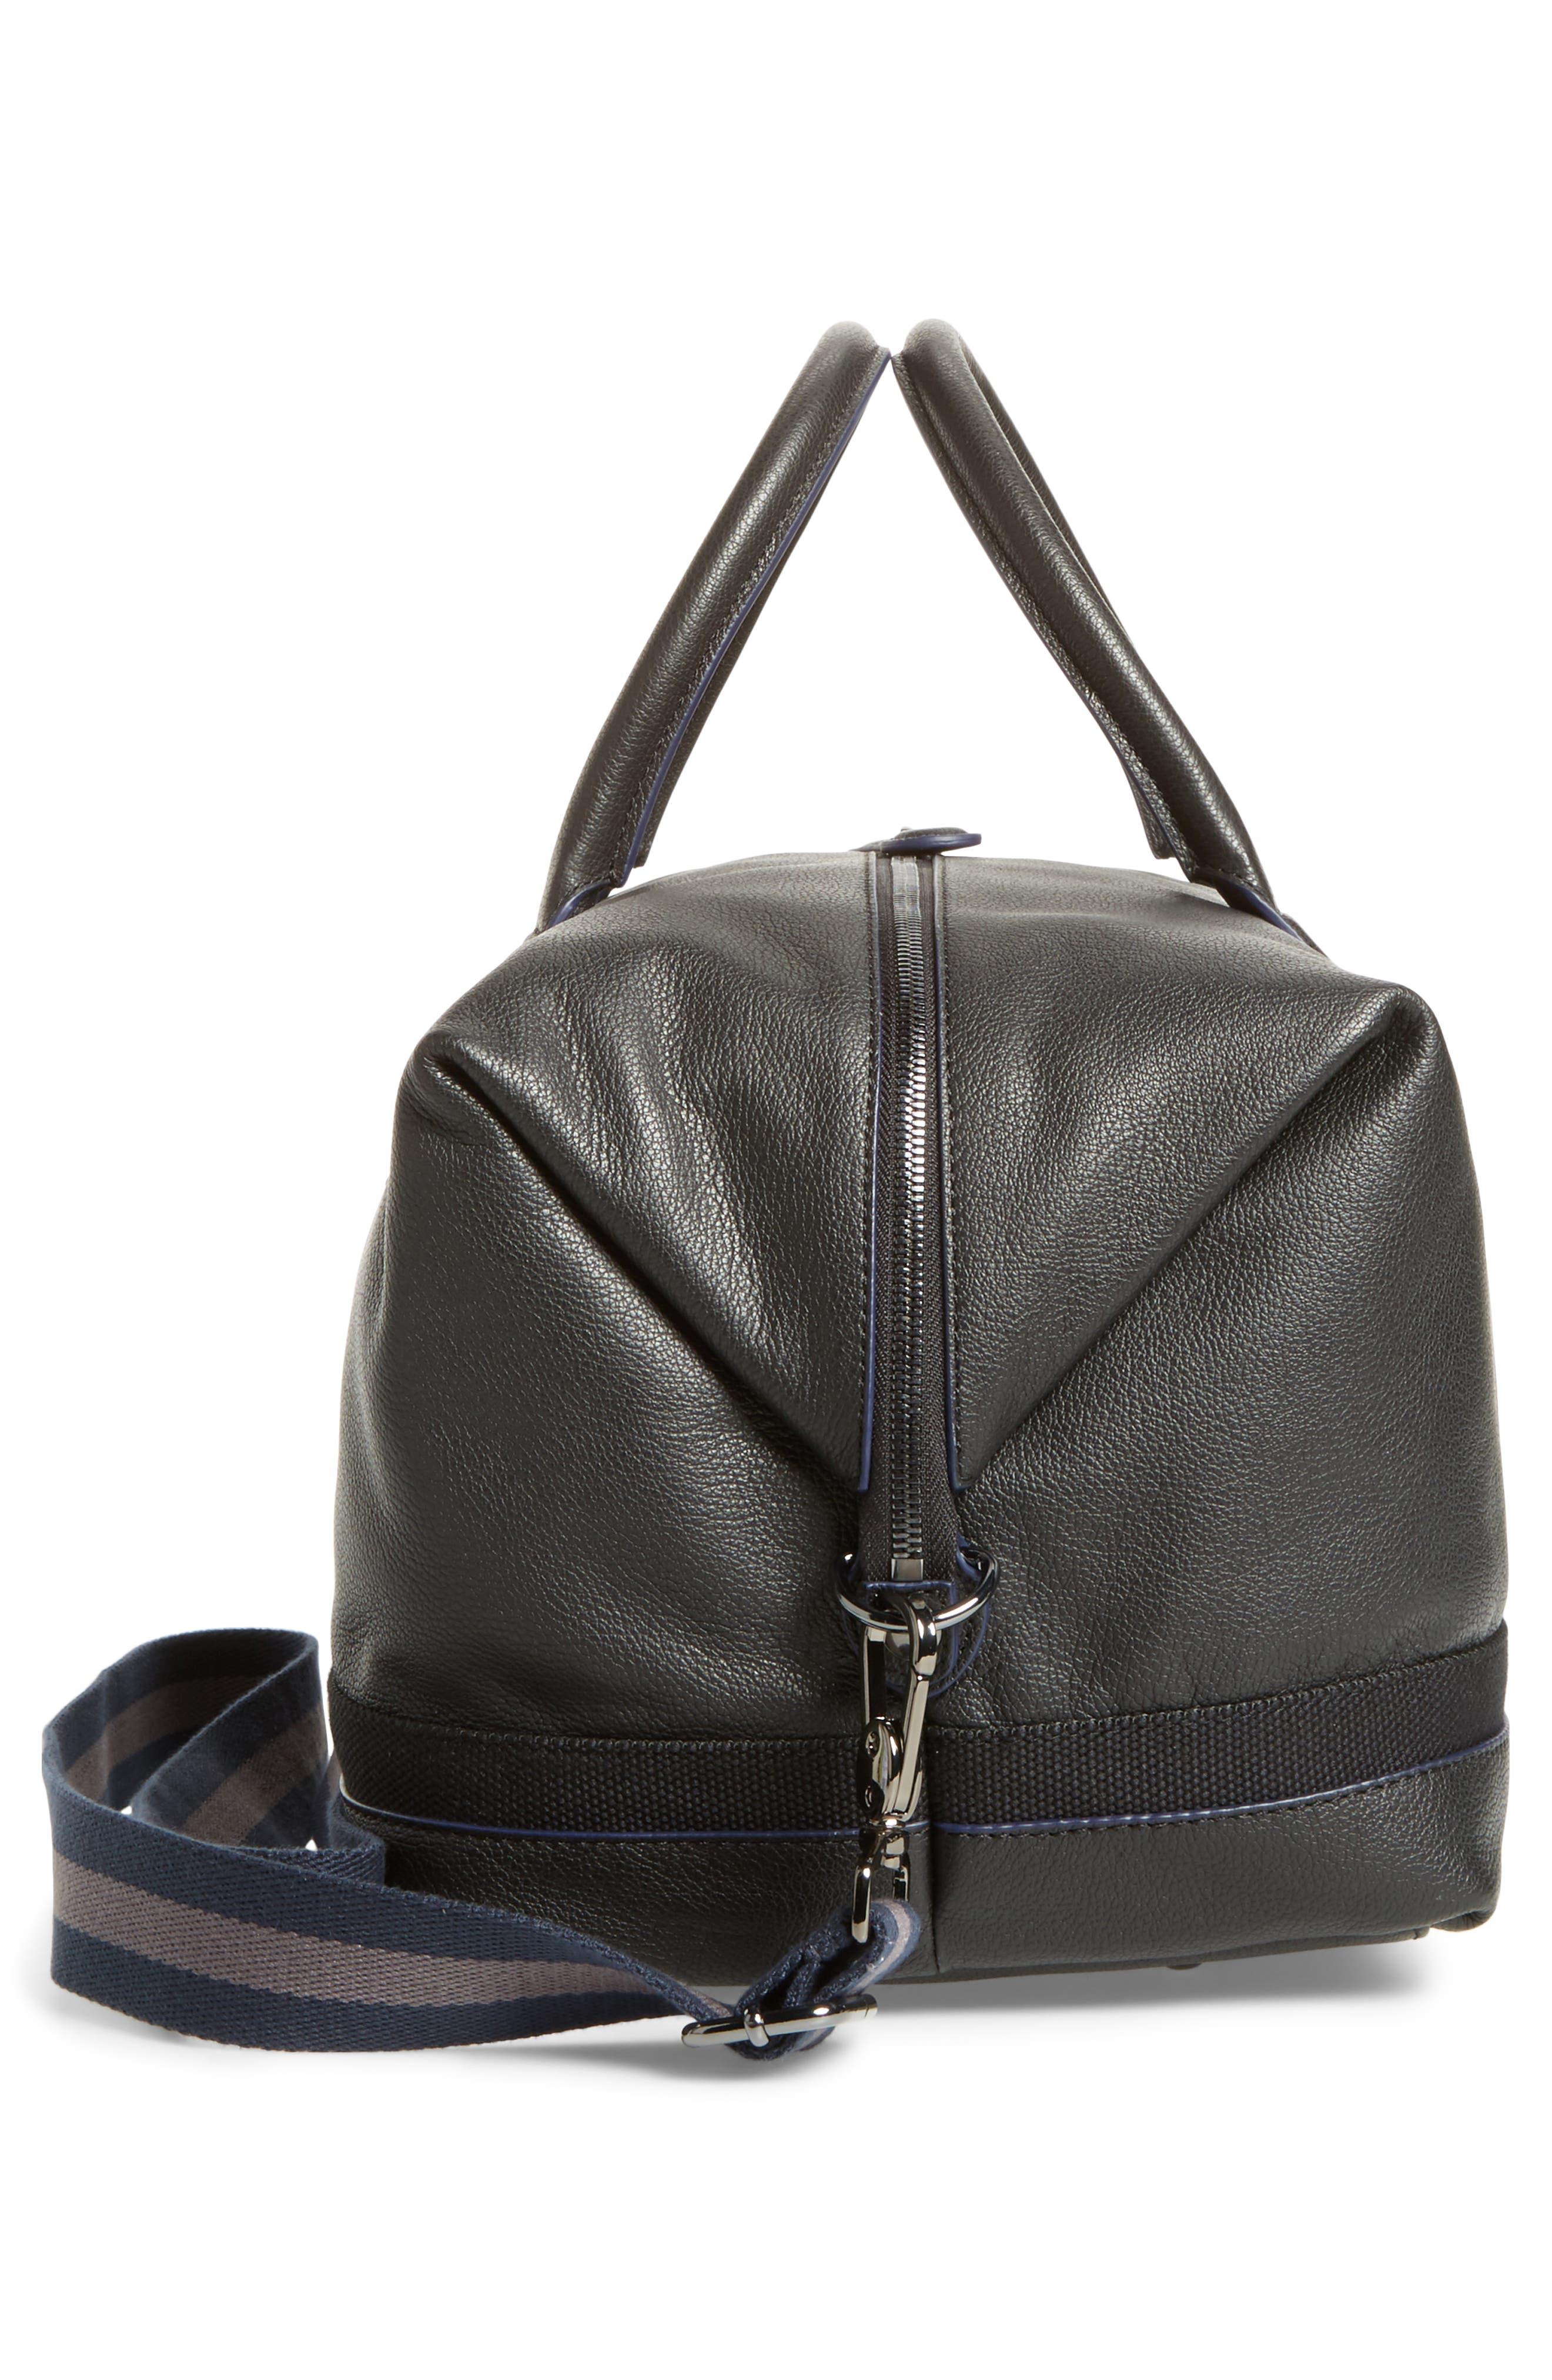 Mylow Duffel Bag,                             Alternate thumbnail 5, color,                             Black